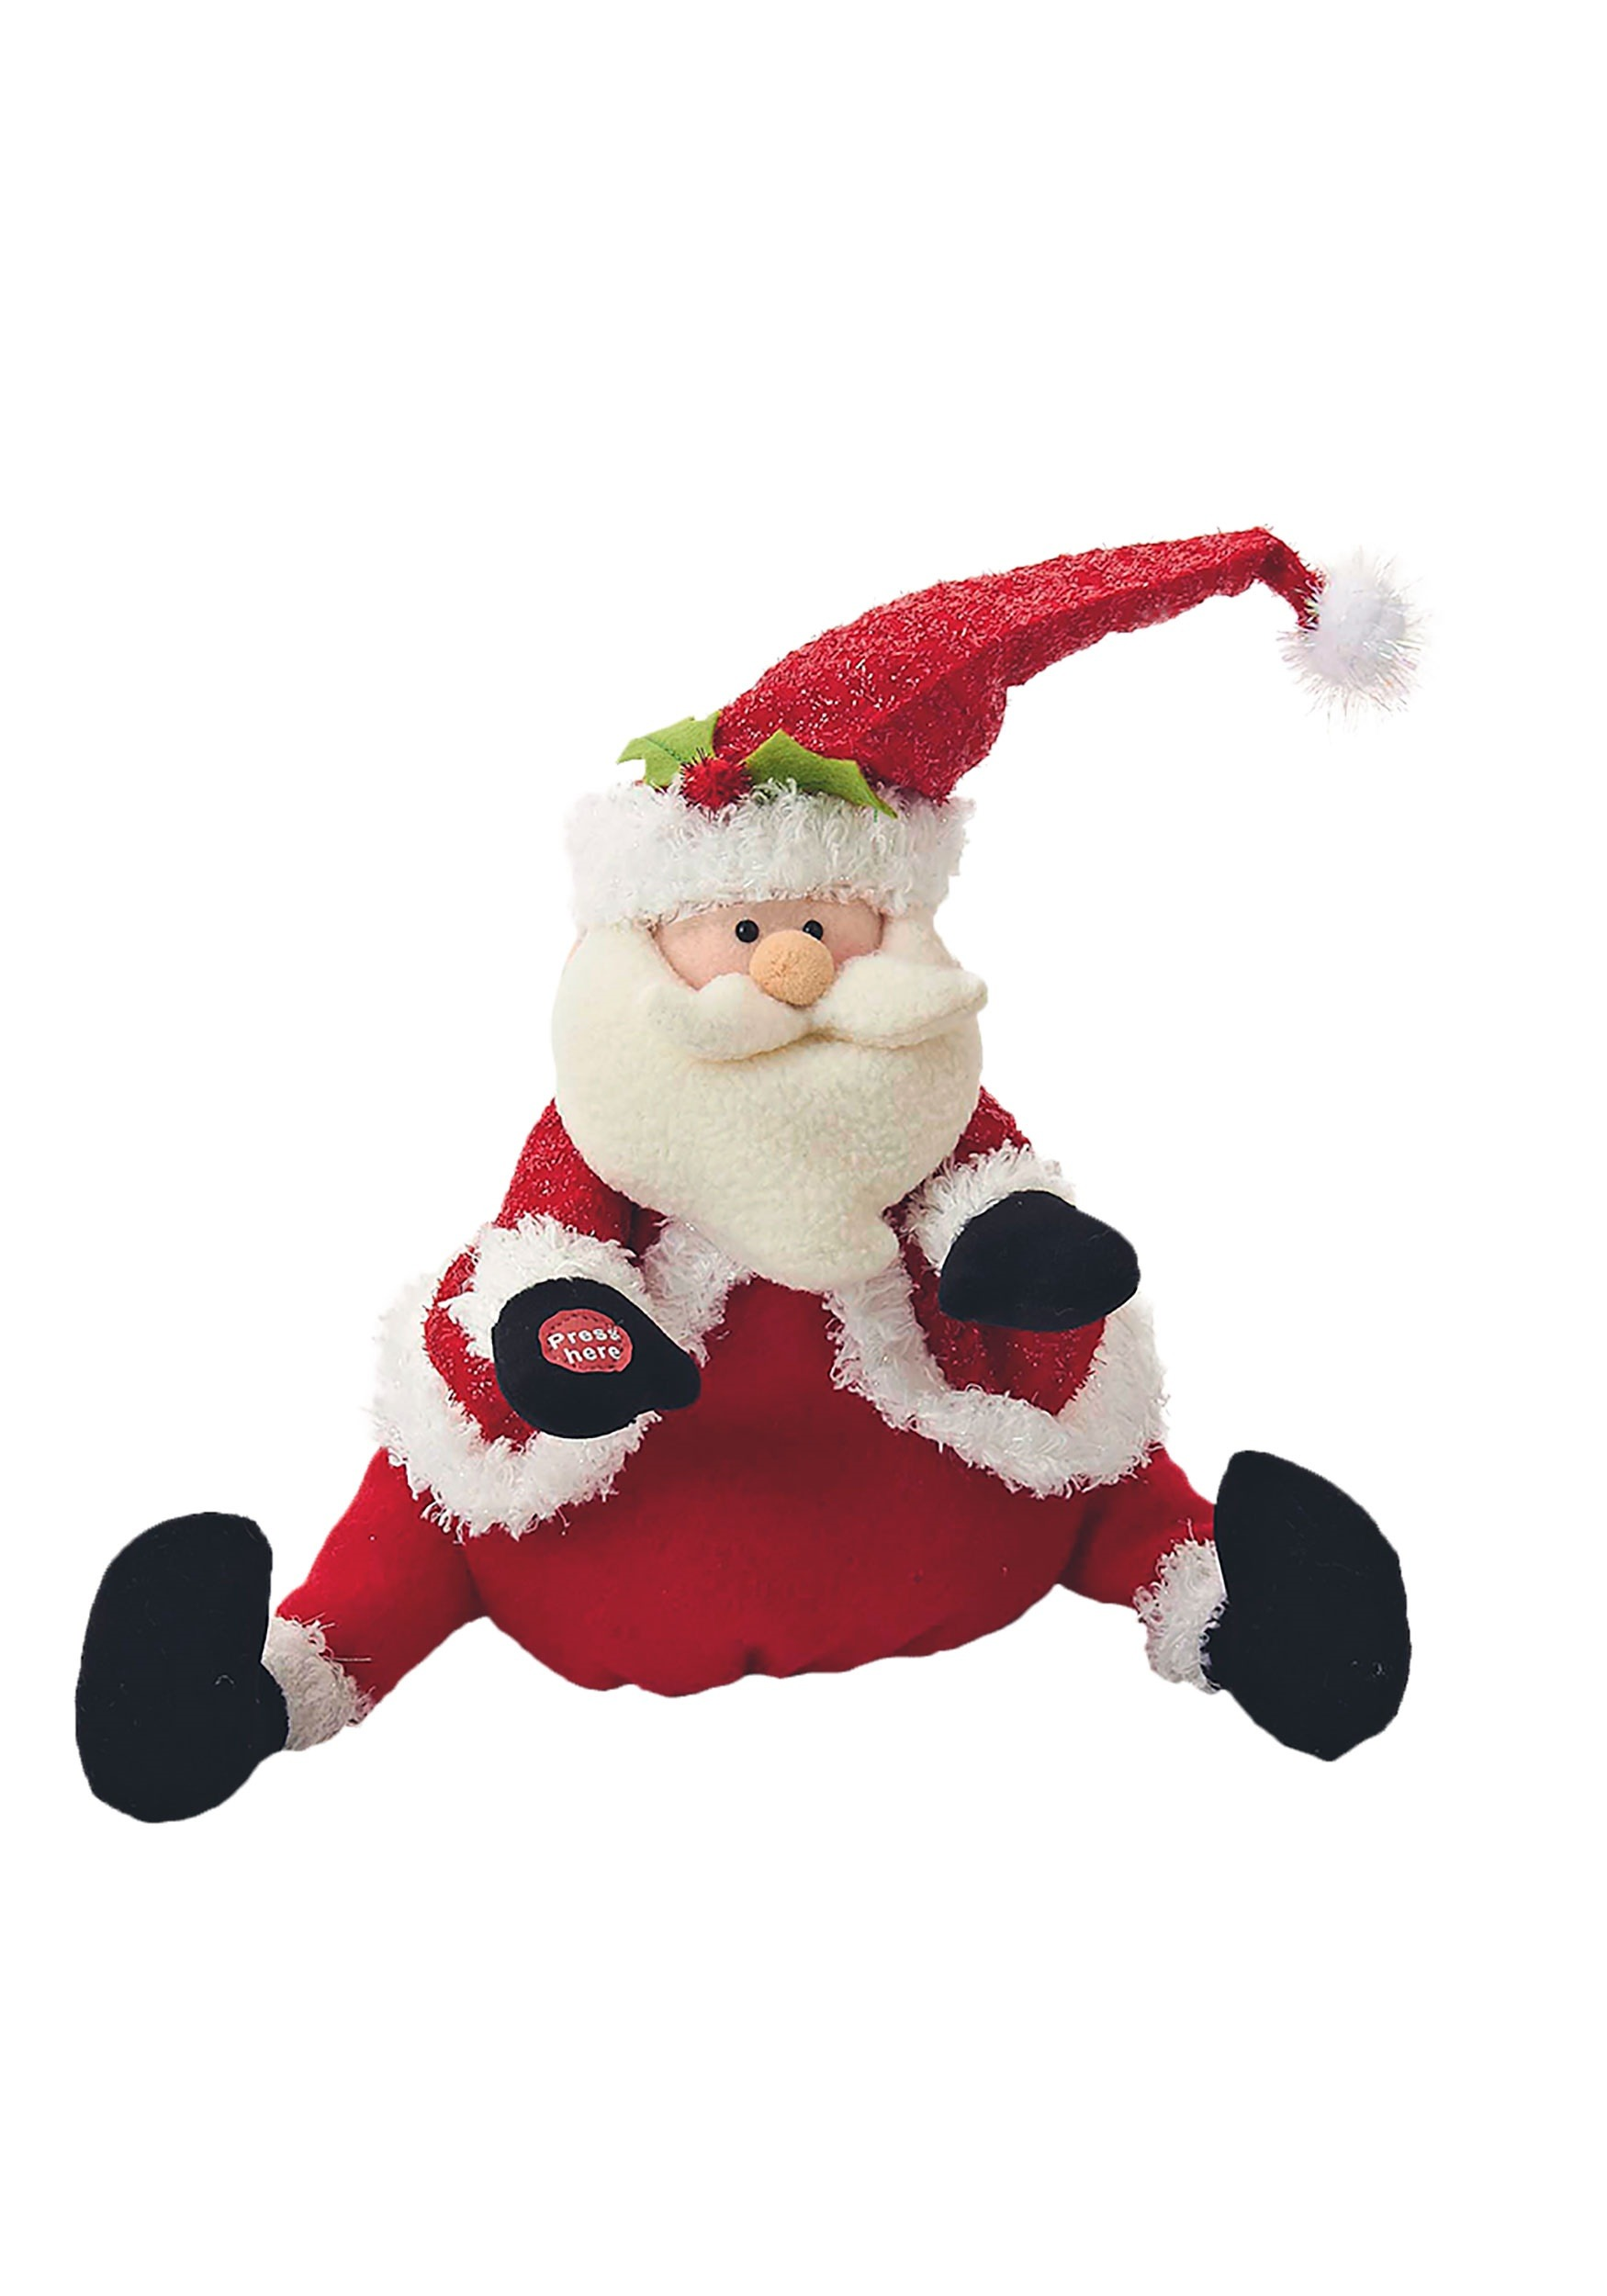 Singing & Dancing Santa Plush Decoration